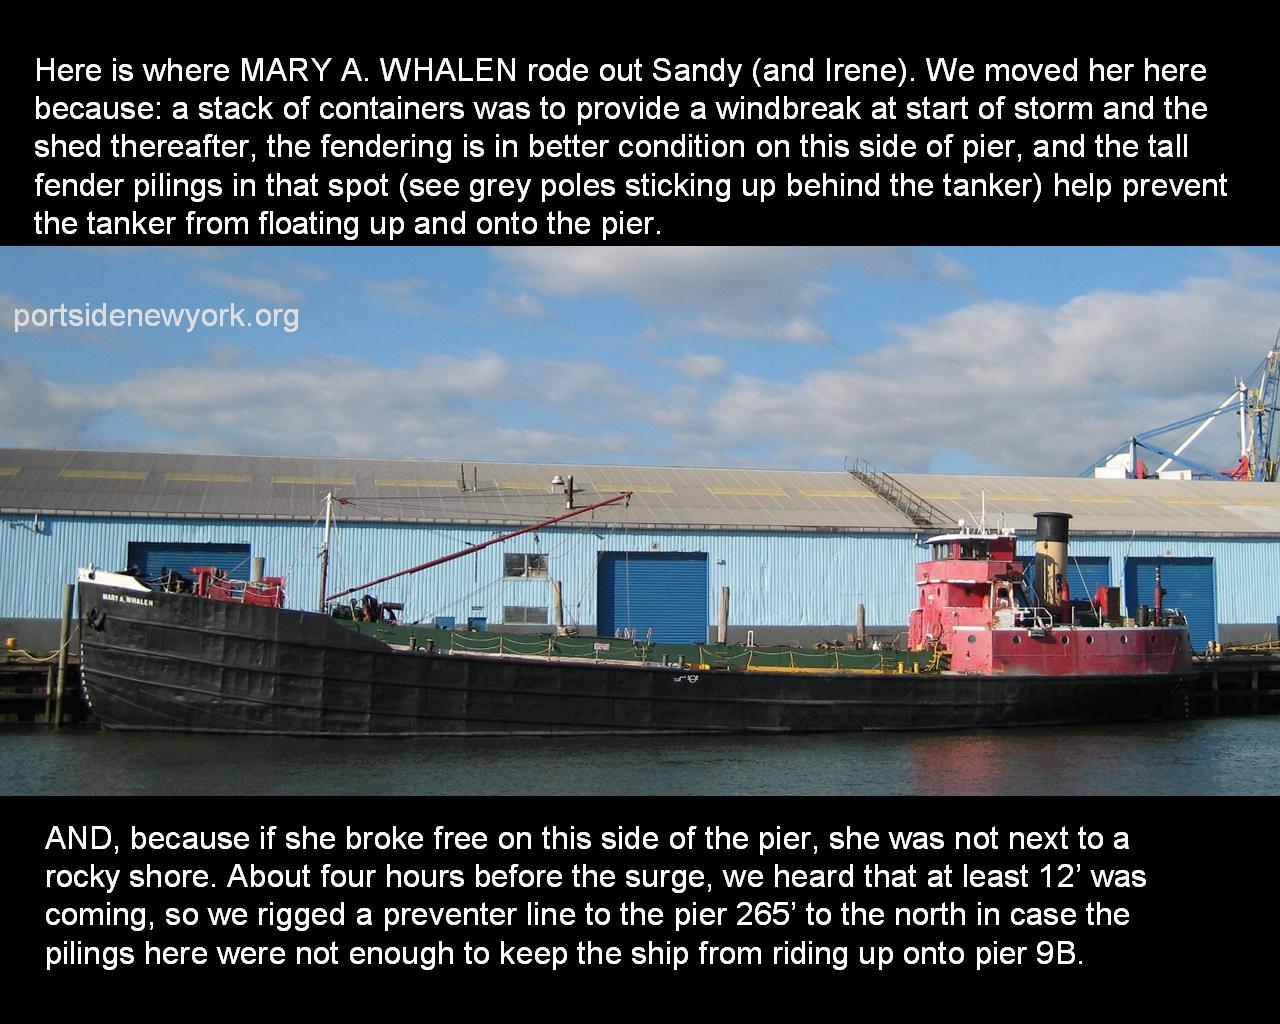 PSNY-Sandy-slide (5).jpg